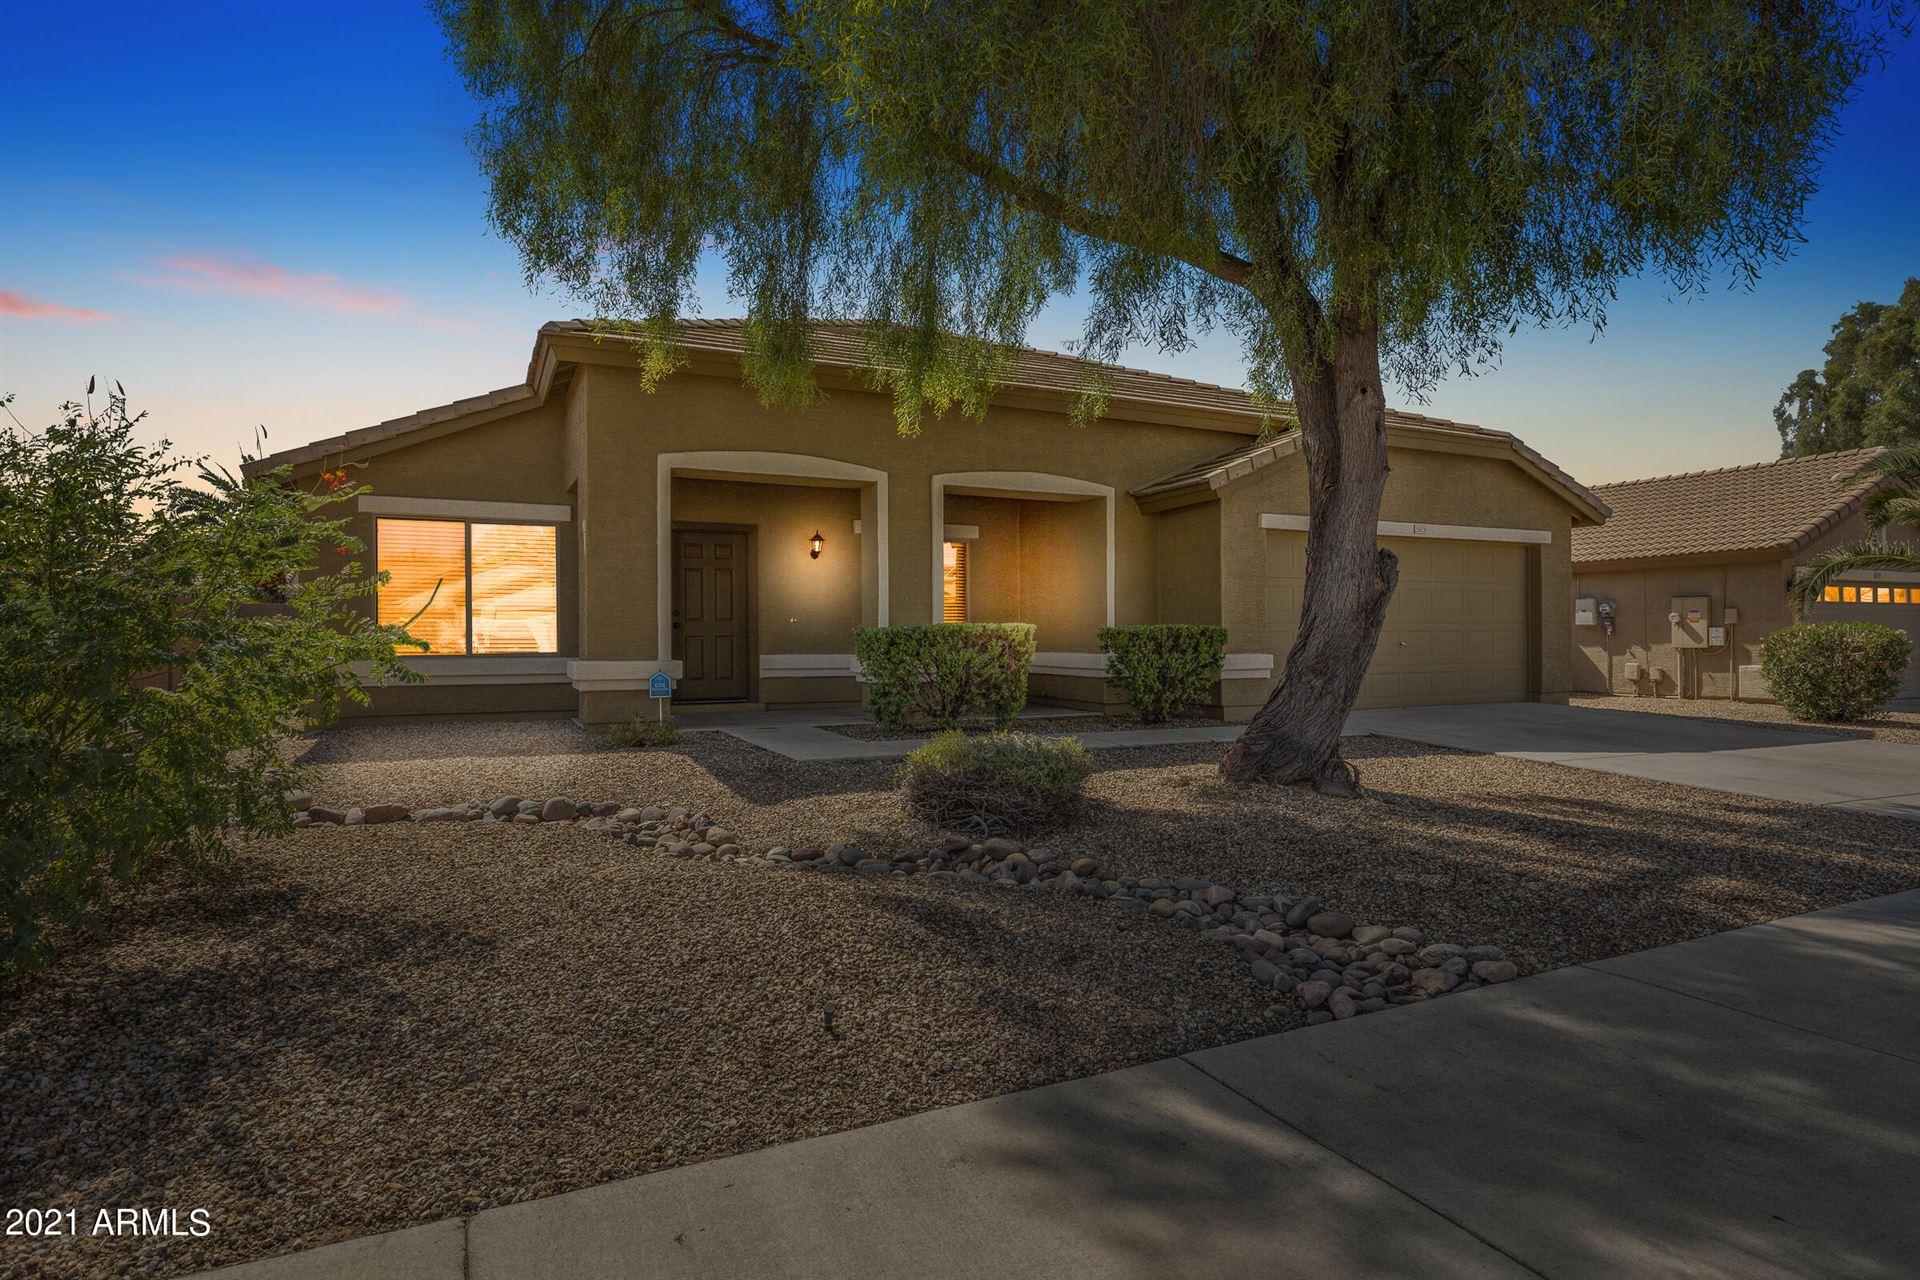 Photo of 15873 W TOHONO Drive, Goodyear, AZ 85338 (MLS # 6307530)